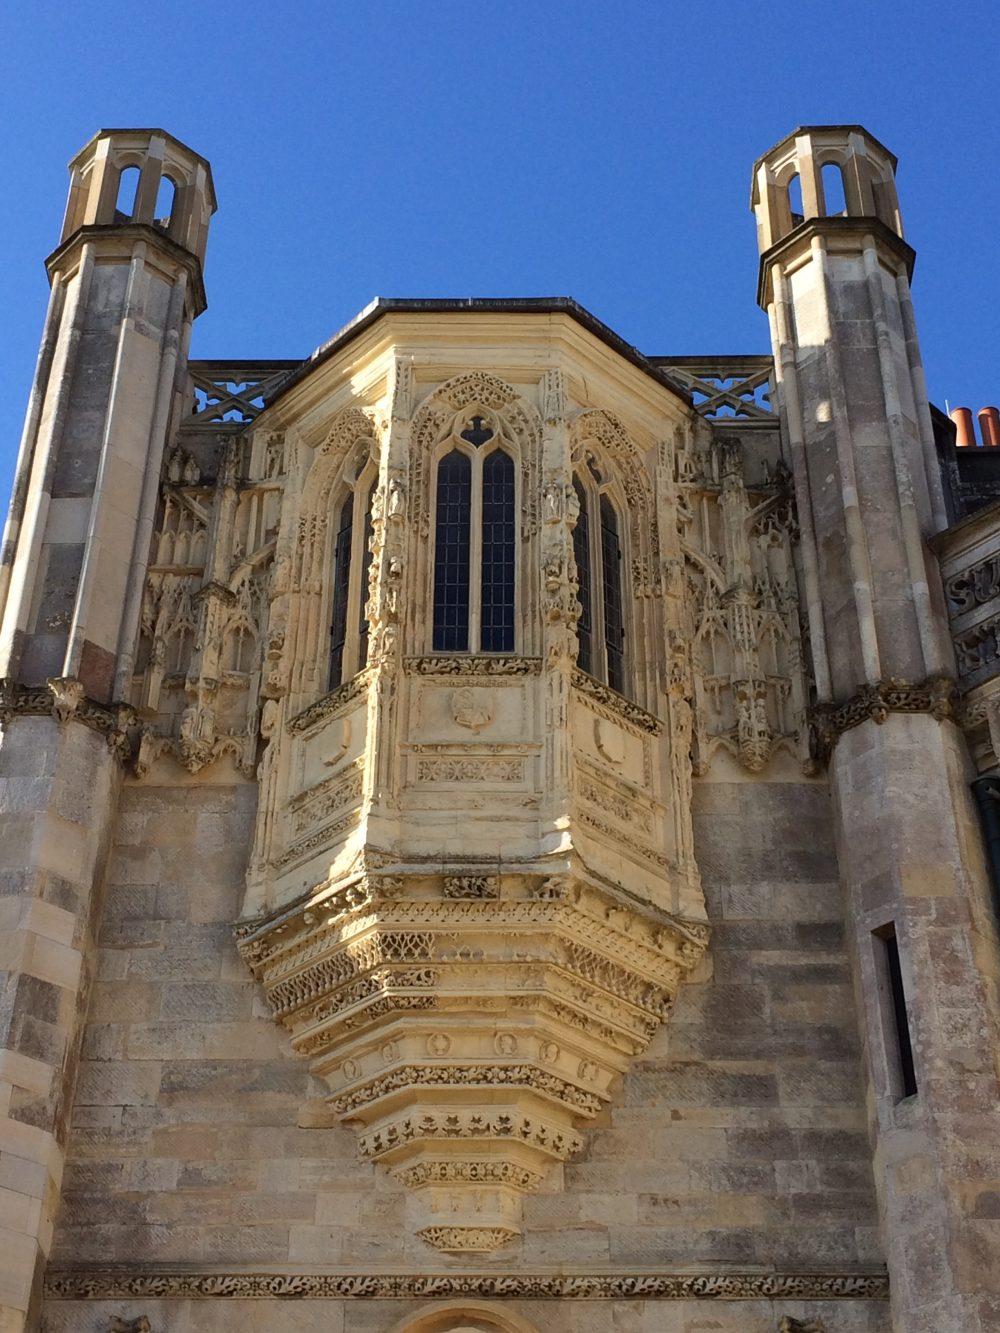 Carved and decorative stone Oriel window under deep blue sky